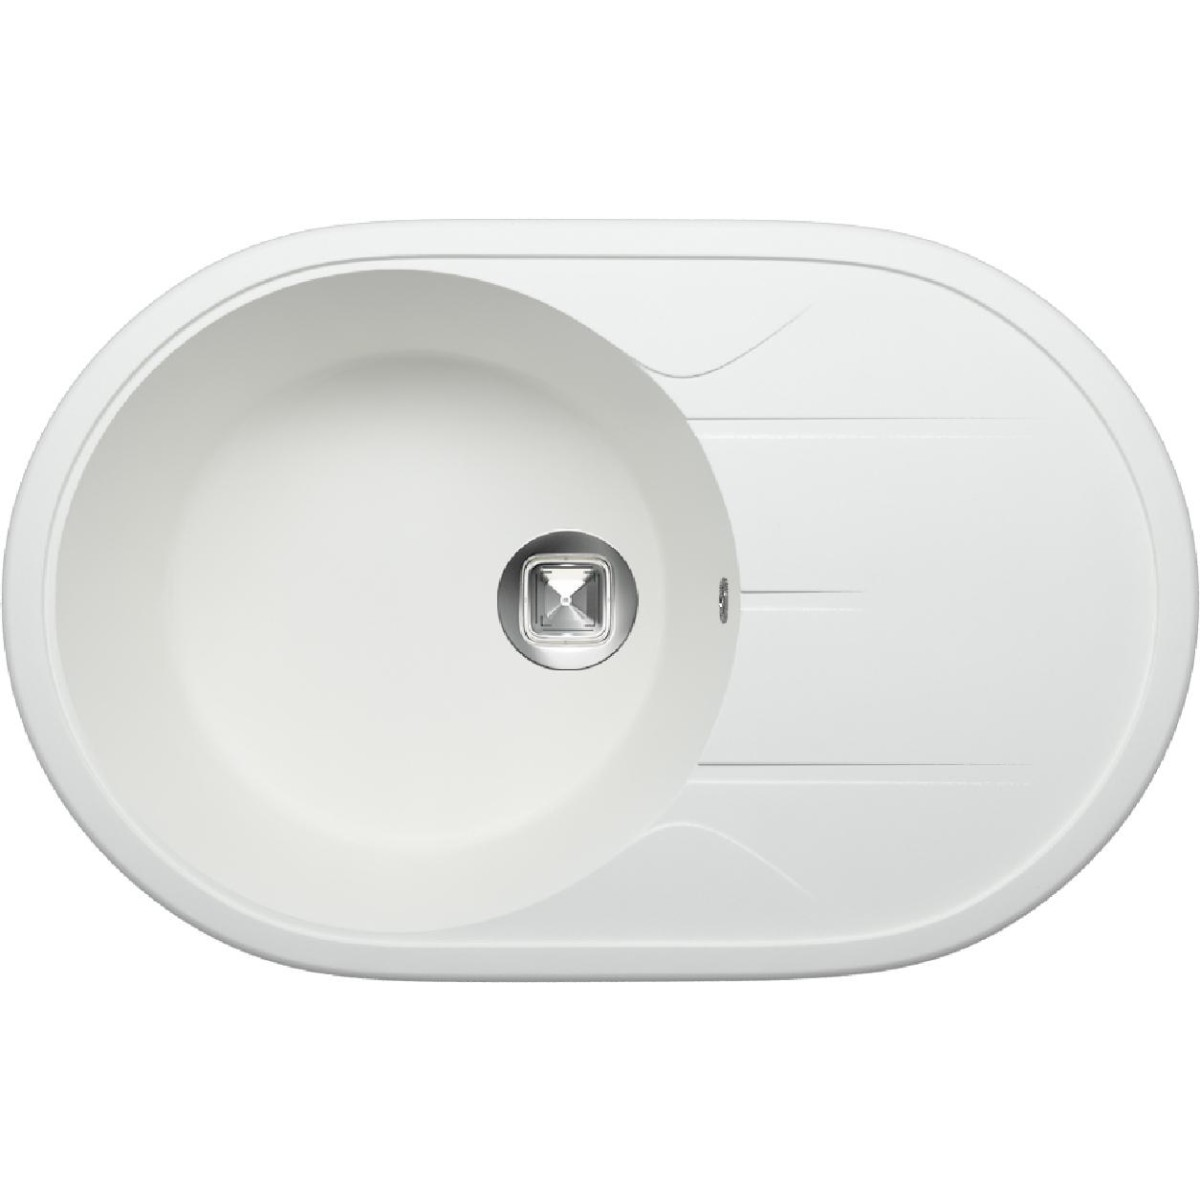 Кухонная мойка TOLERO  R-116 №923 (Белый)